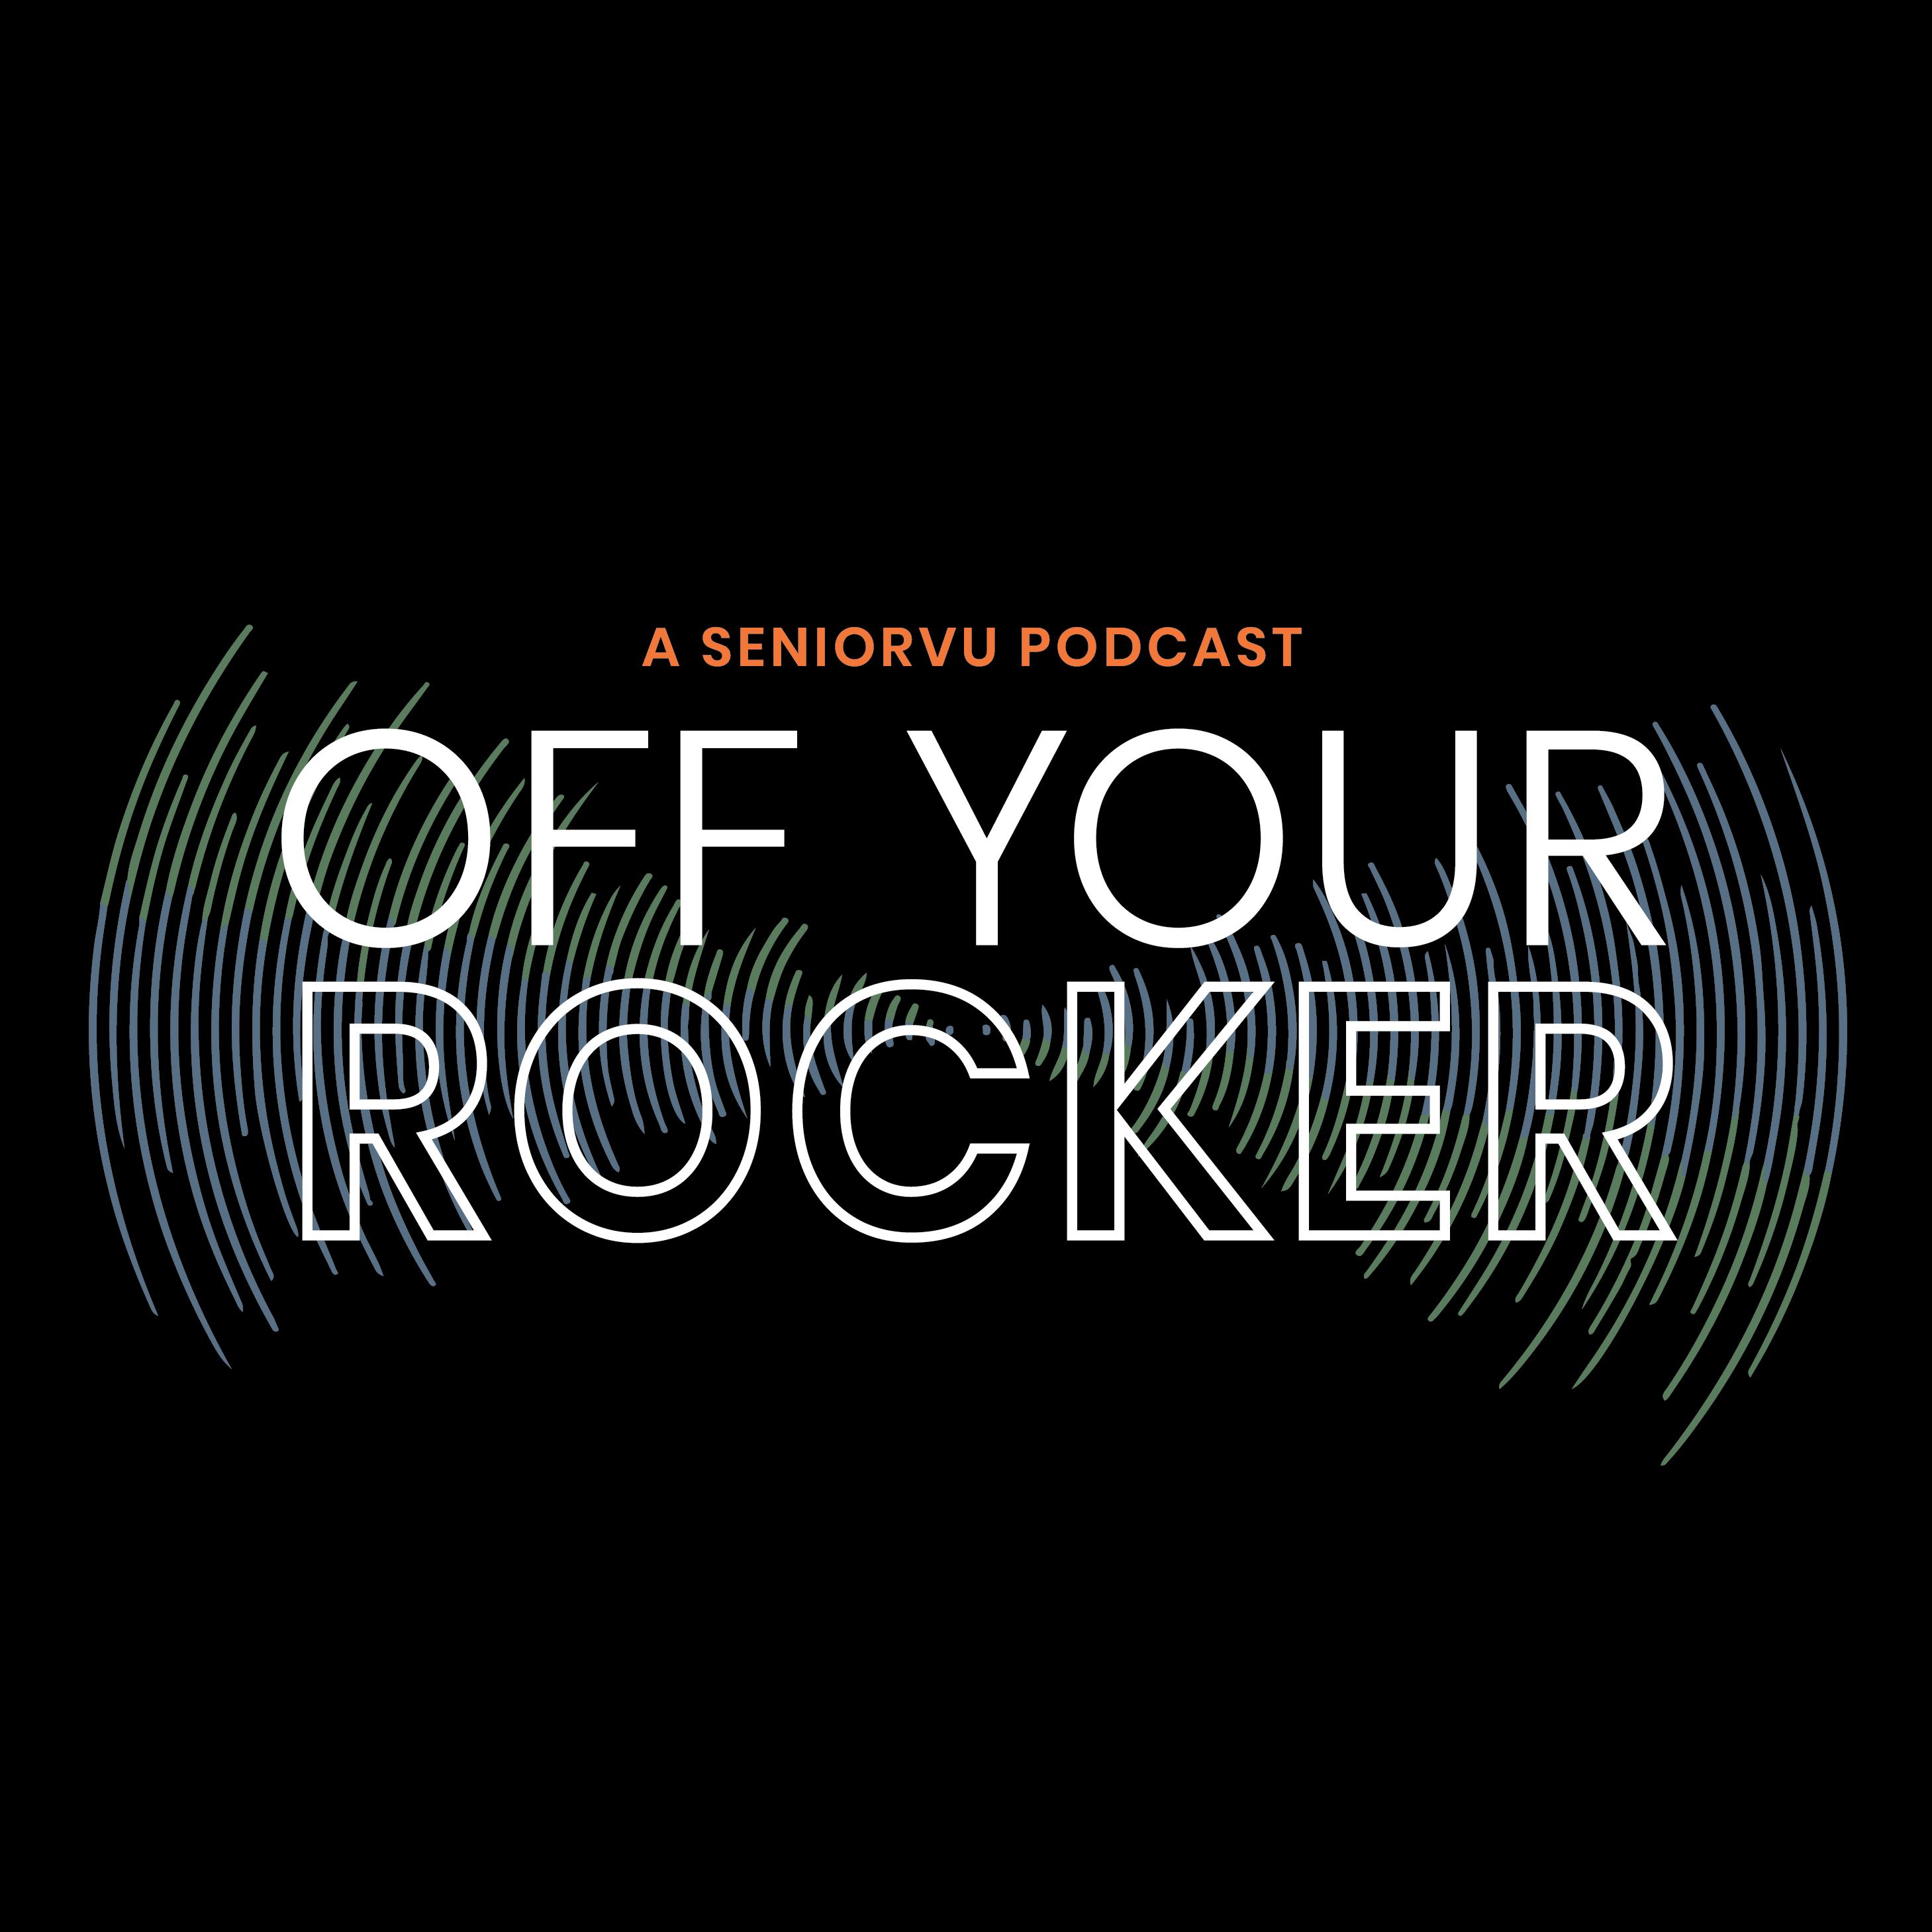 Off Your Rocker, A SeniorVu Podcast show art